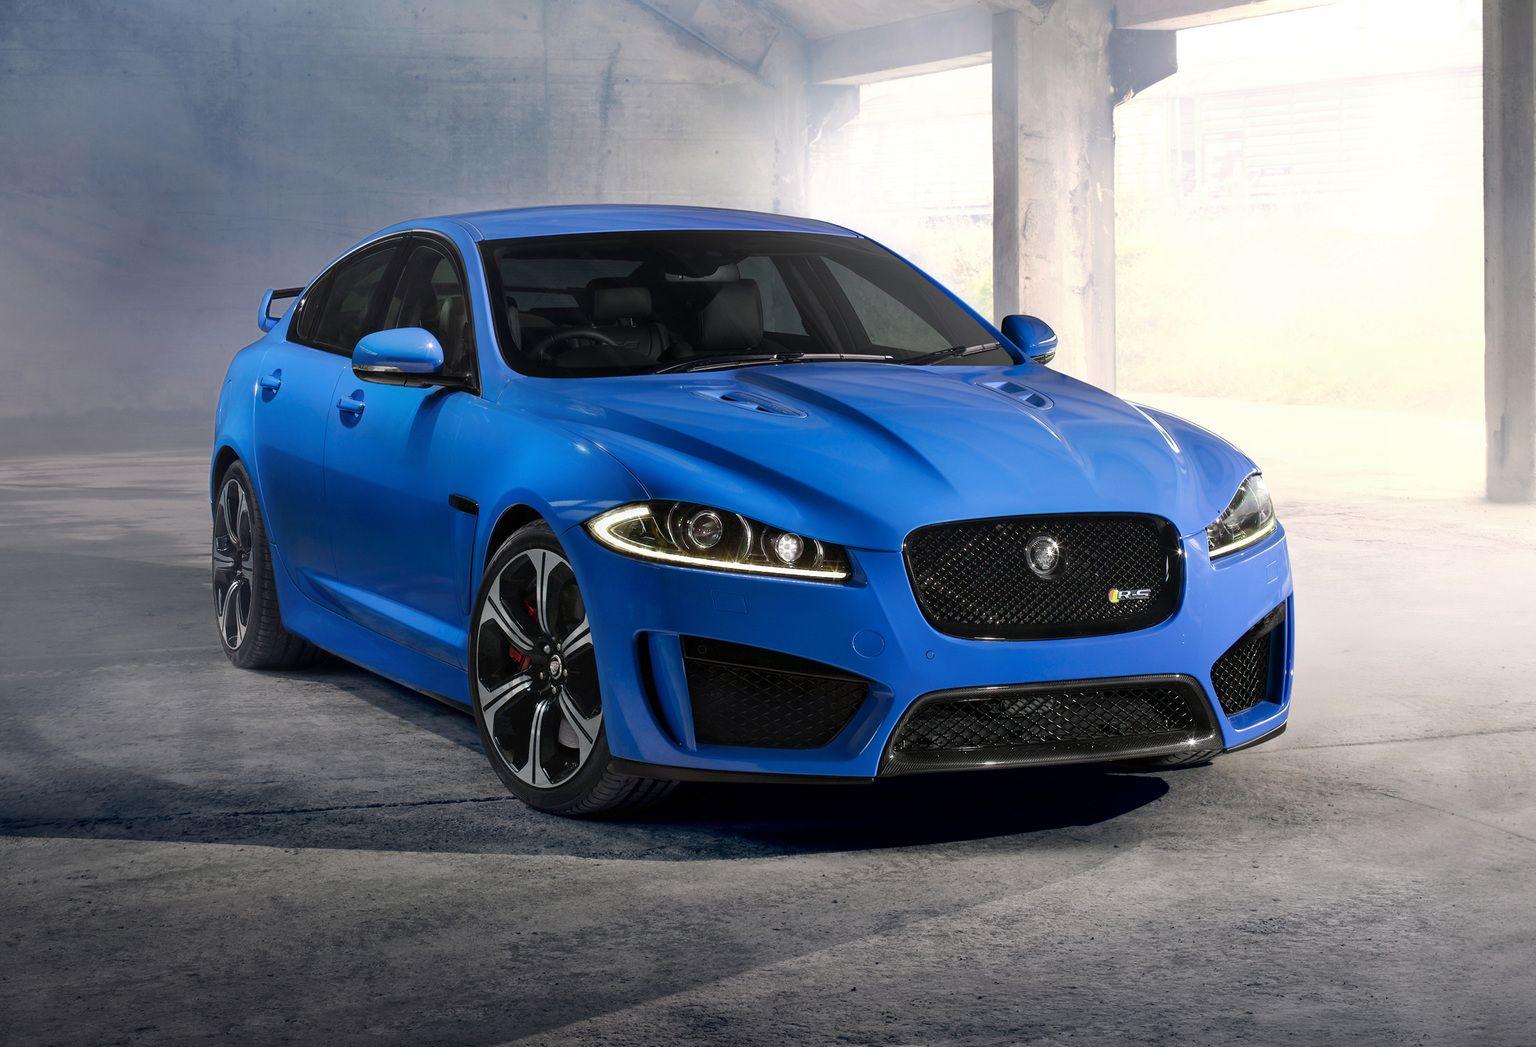 Supercar & Sports Car Pictures (Ultimate Hub)   Jaguar car ...